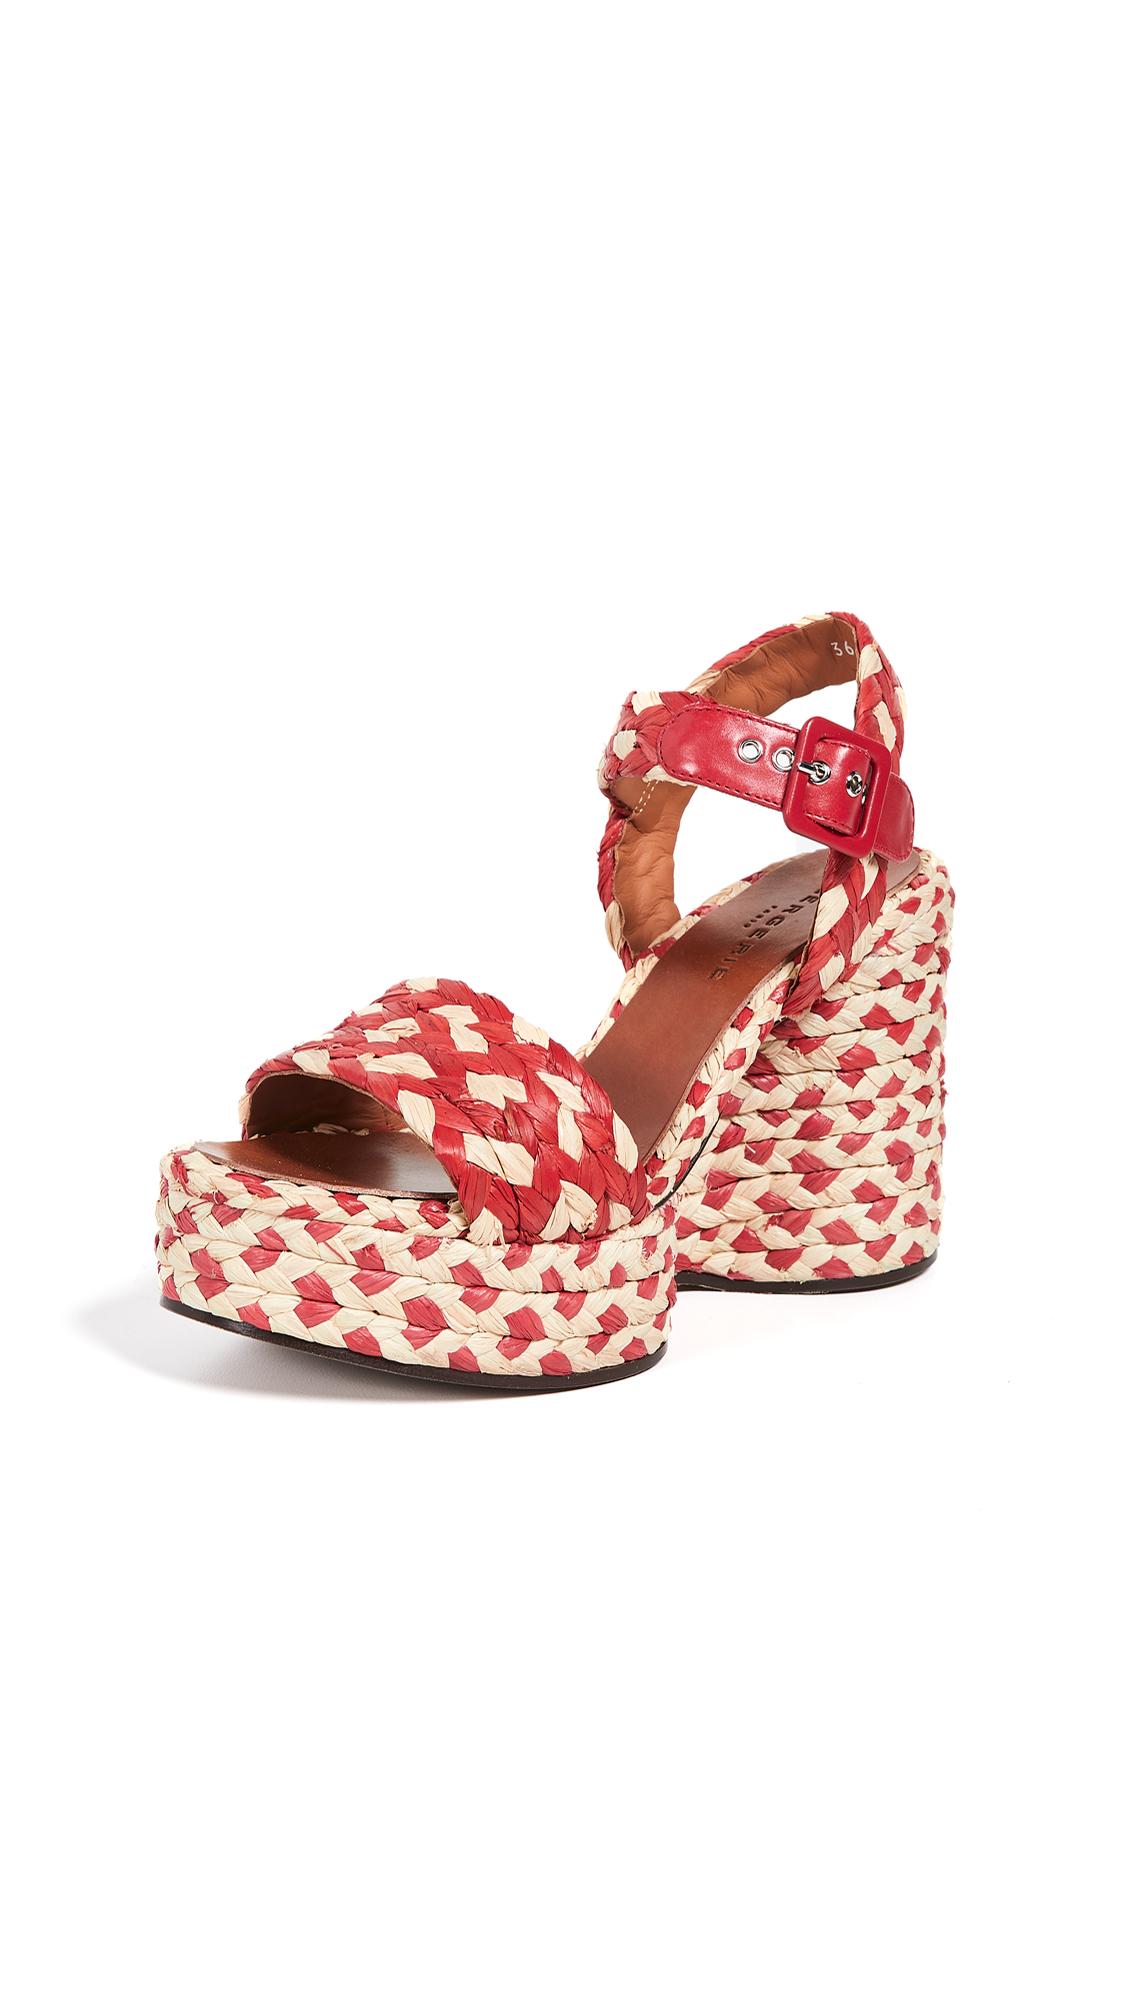 Robert Clergerie Arizona Wedge Sandals - Hibiscus